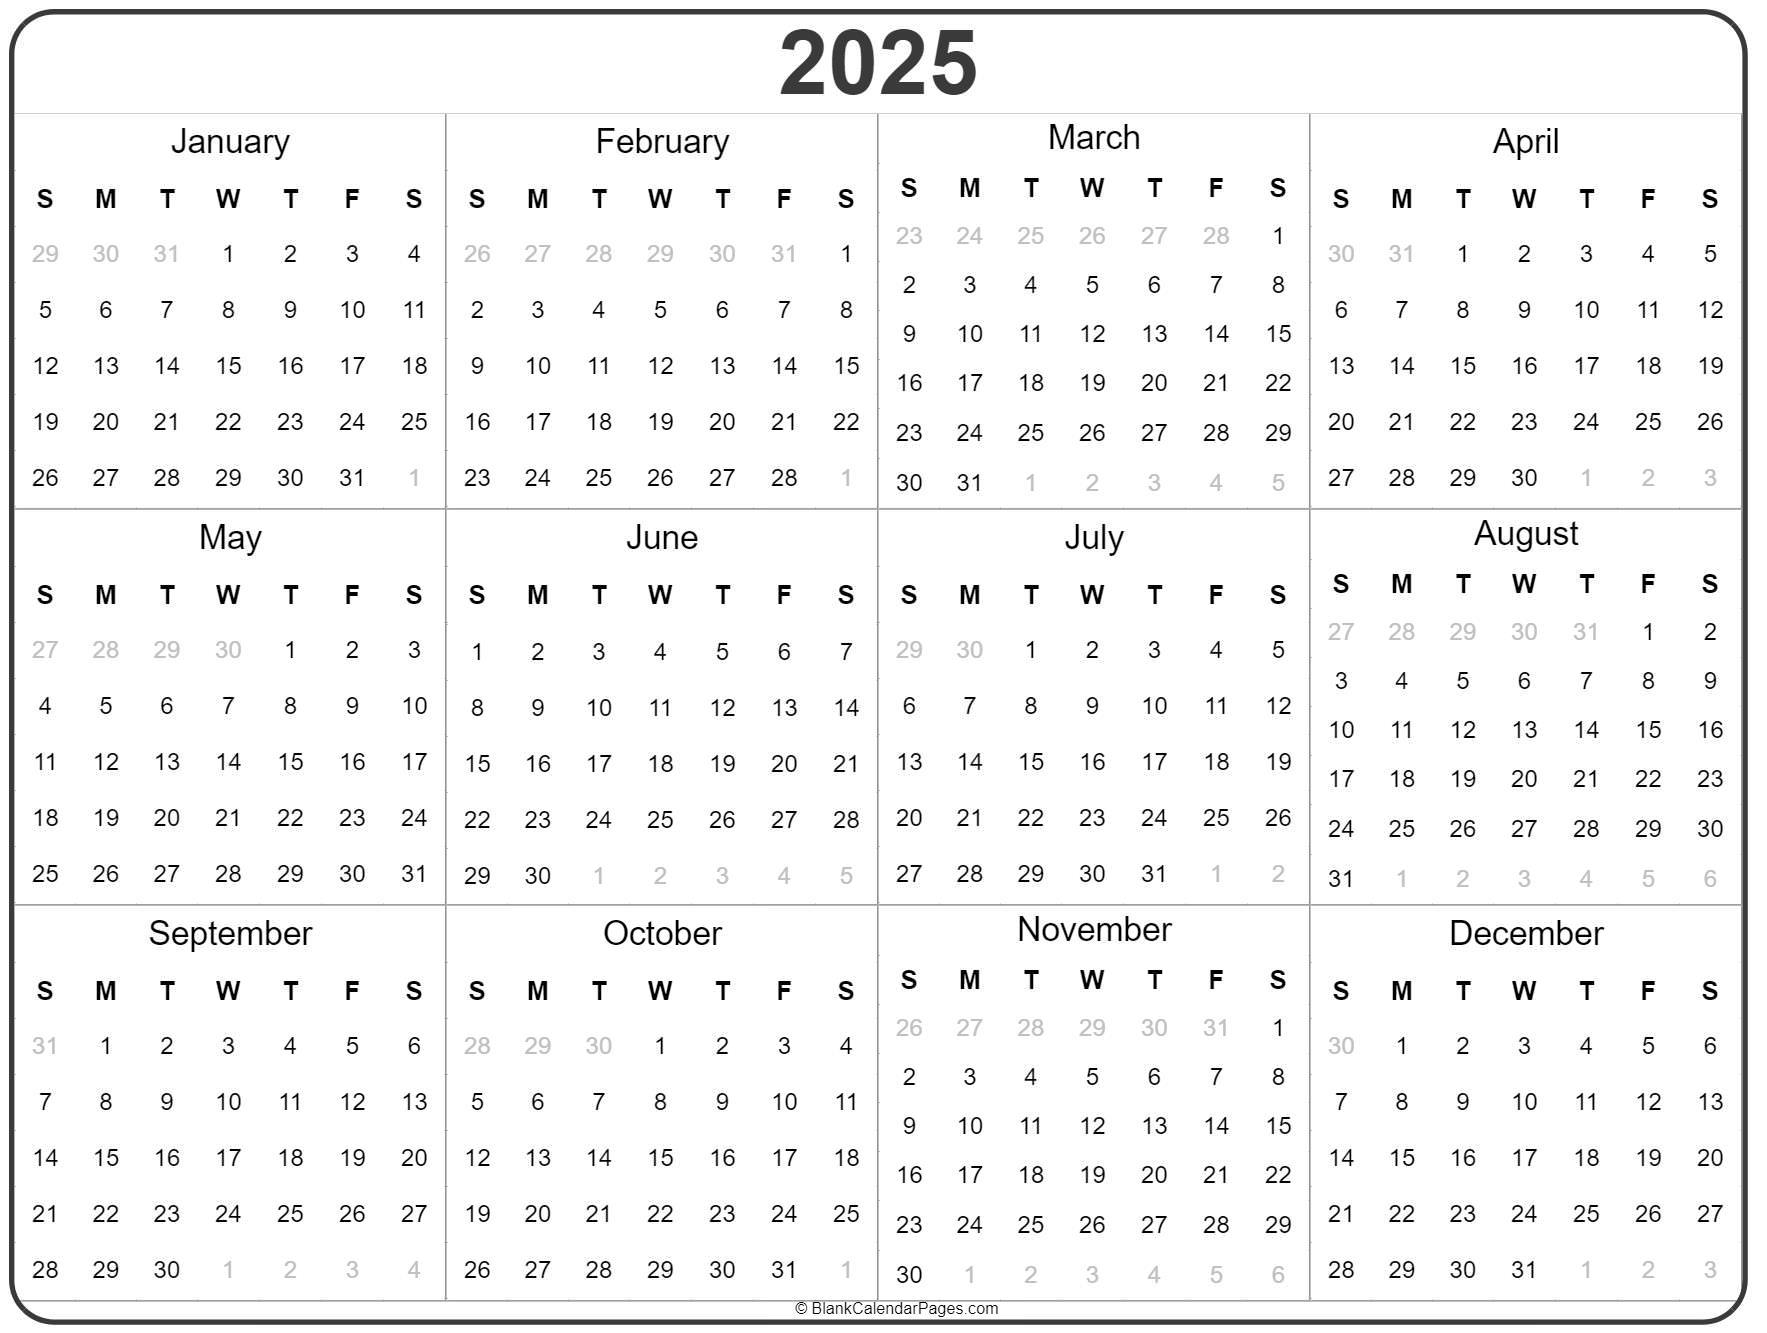 2025 year calendar template